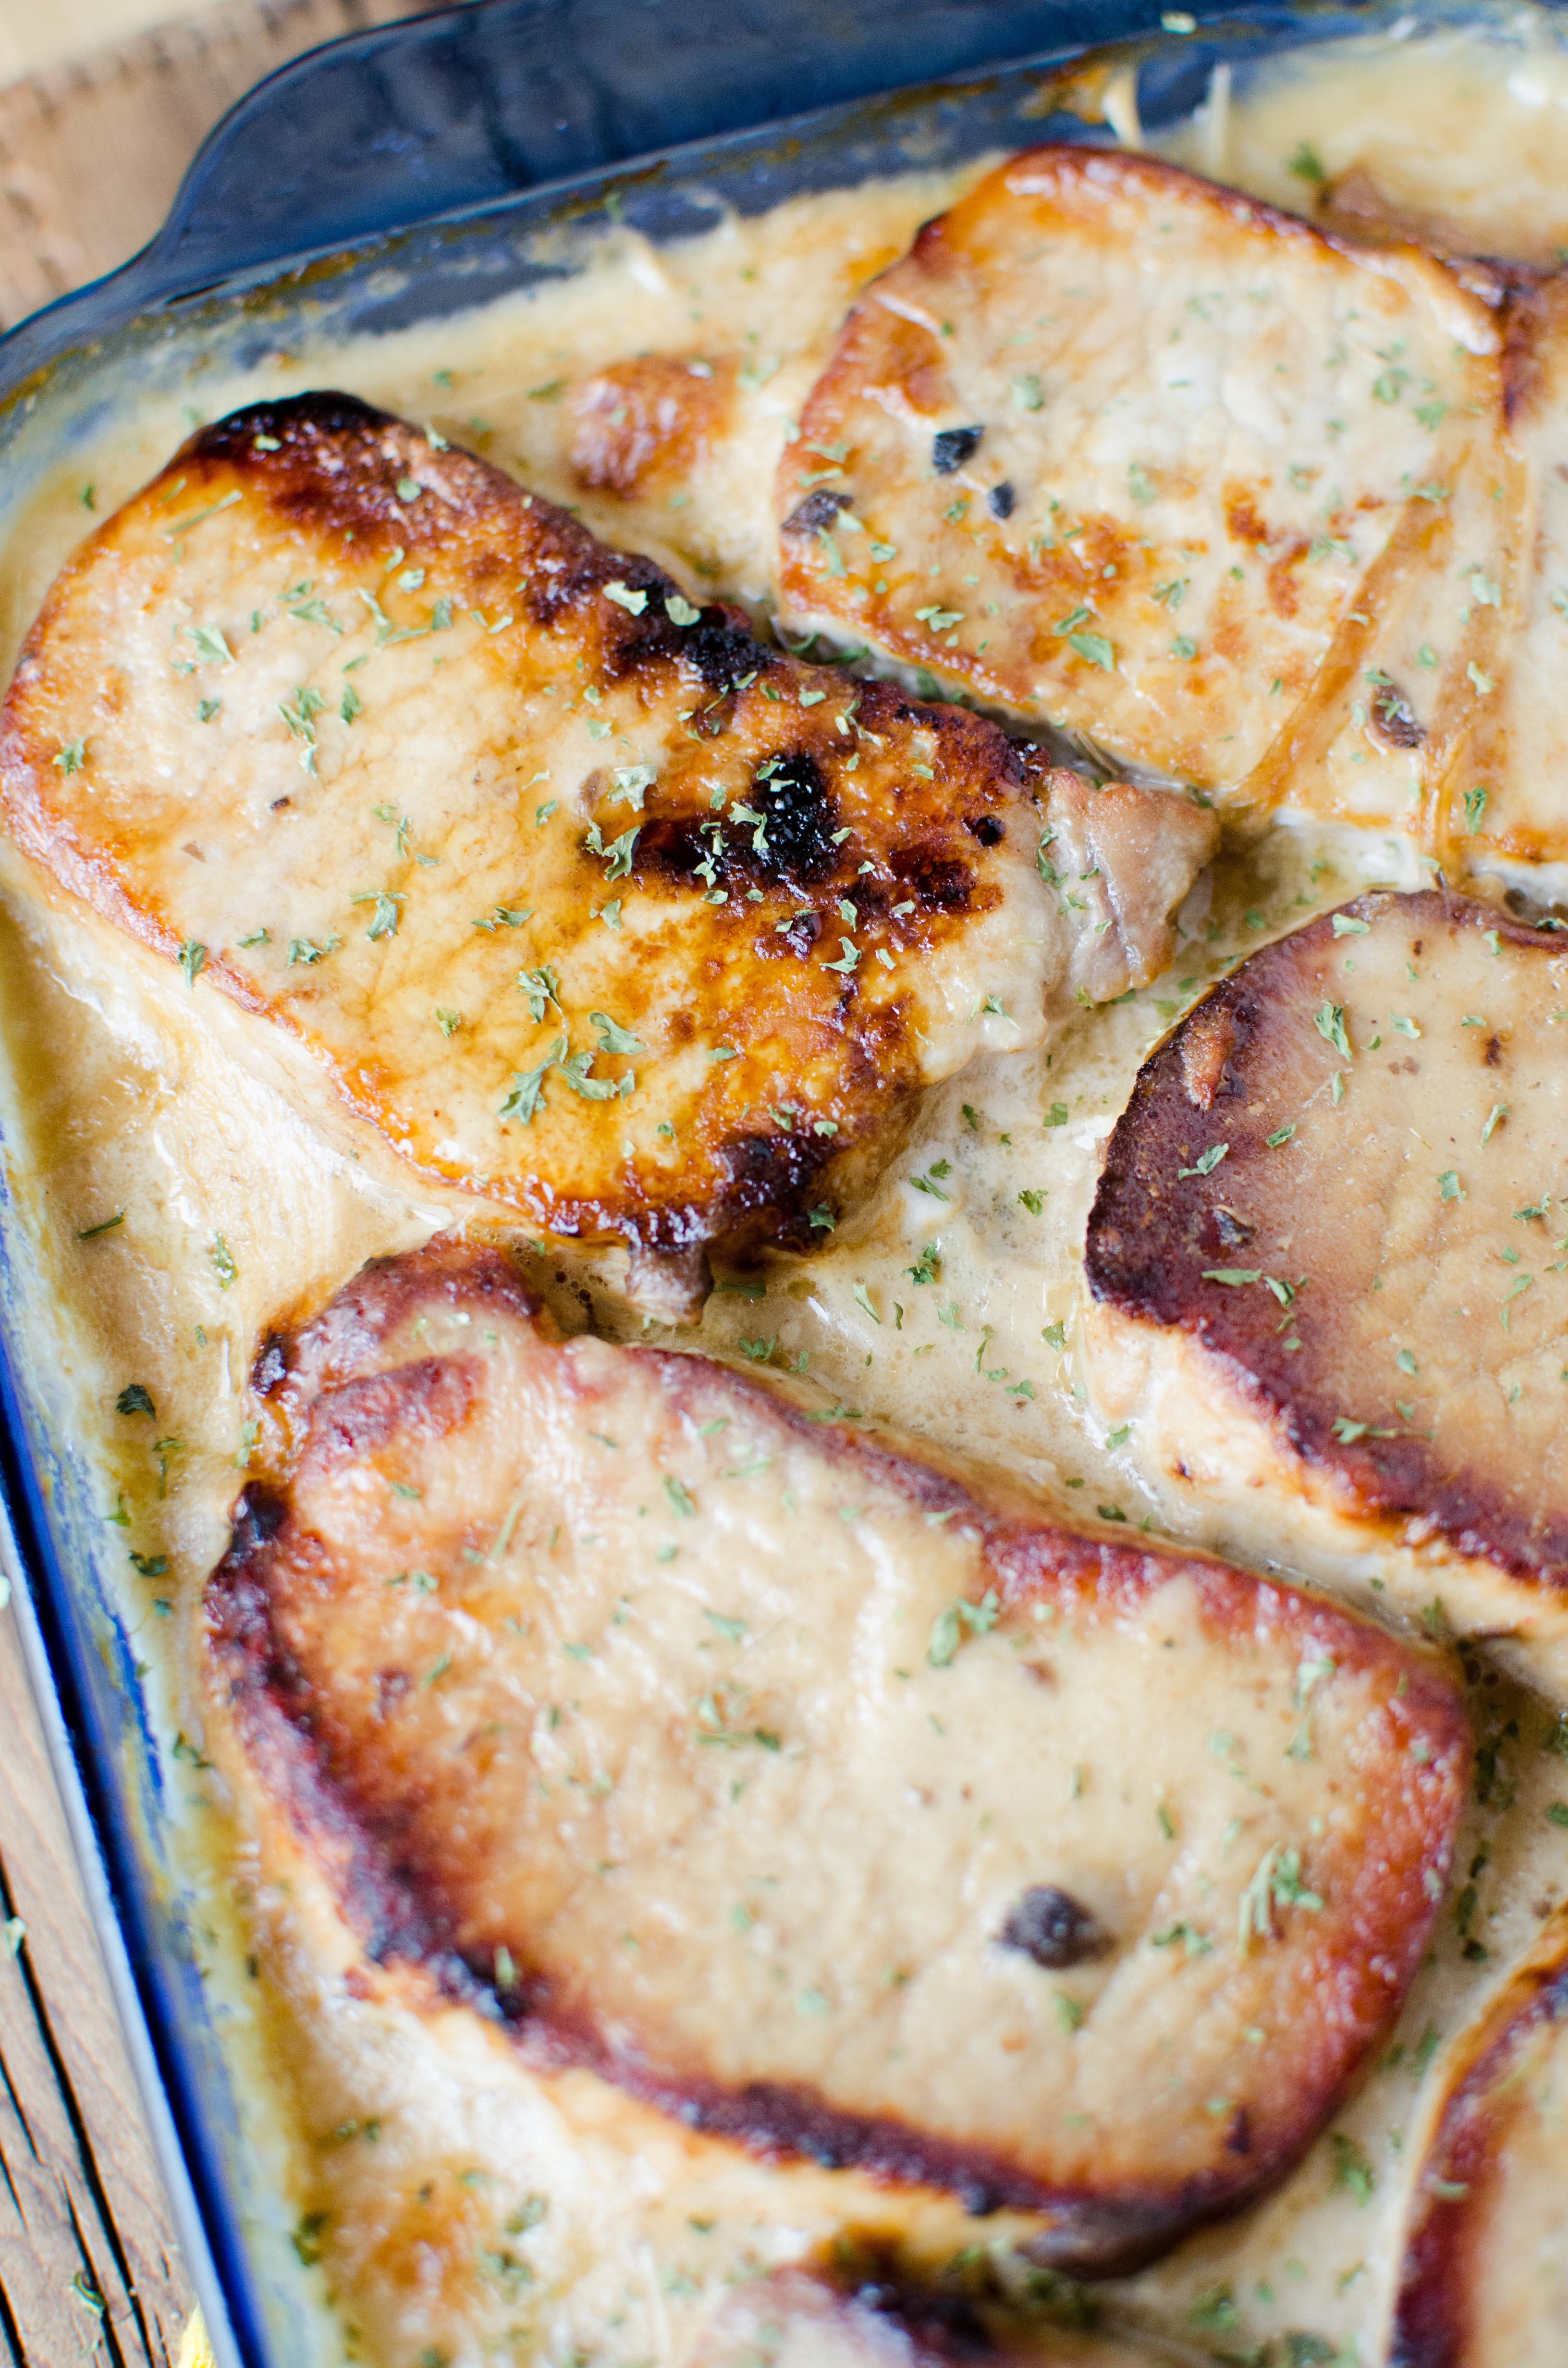 Pork Casserole Recipies  pork chops and scalloped potatoes with cream of mushroom soup